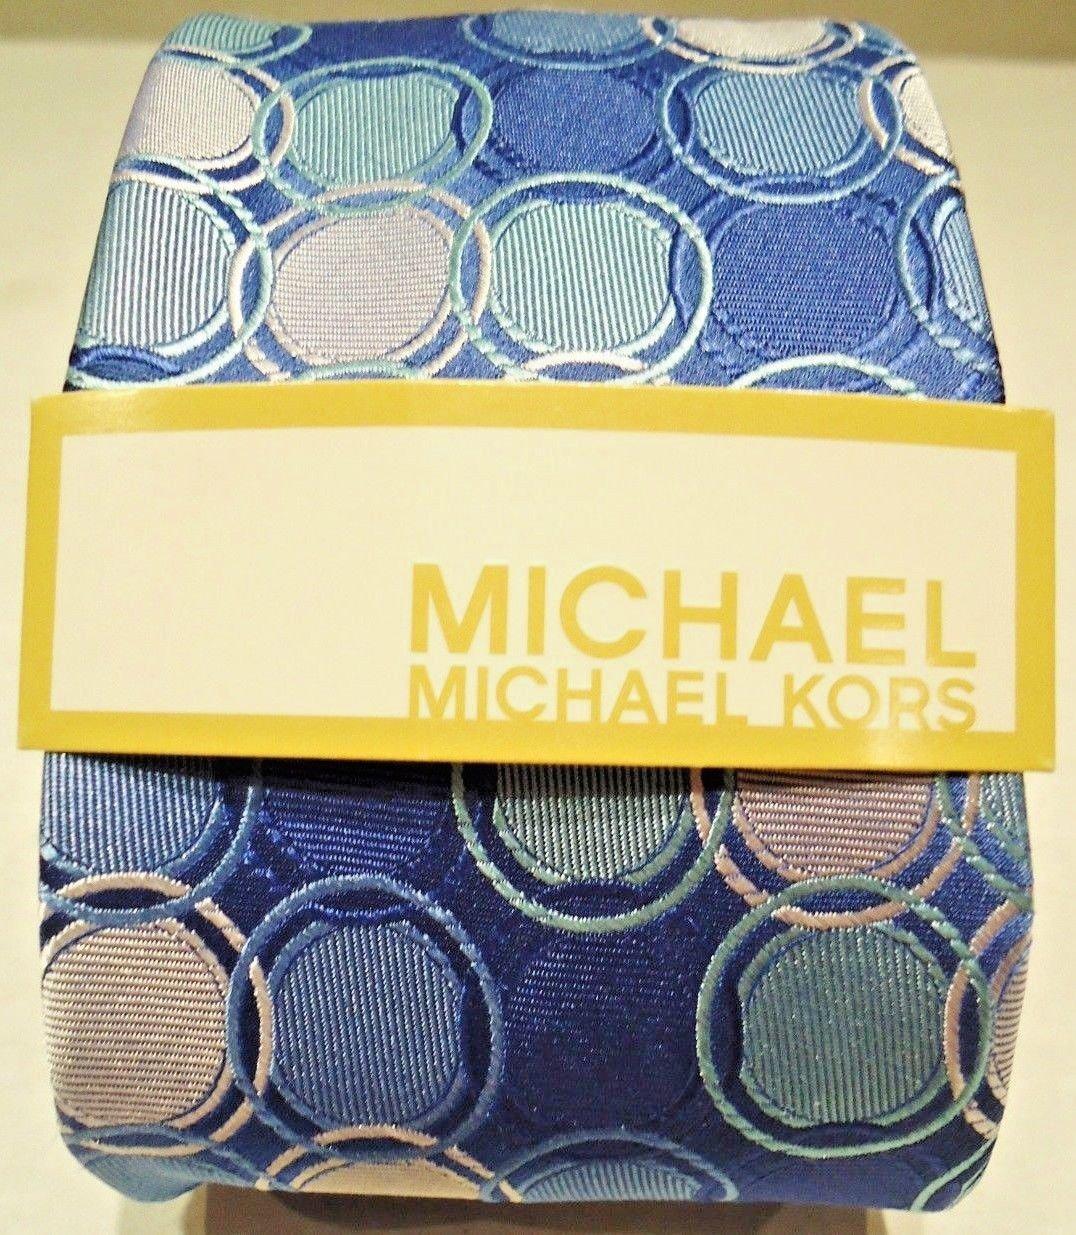 MICHAEL KORS - BLUE - AQUA - PURPLE - CIRCLES - SILK - TIE - NEW - ACCESSORIES